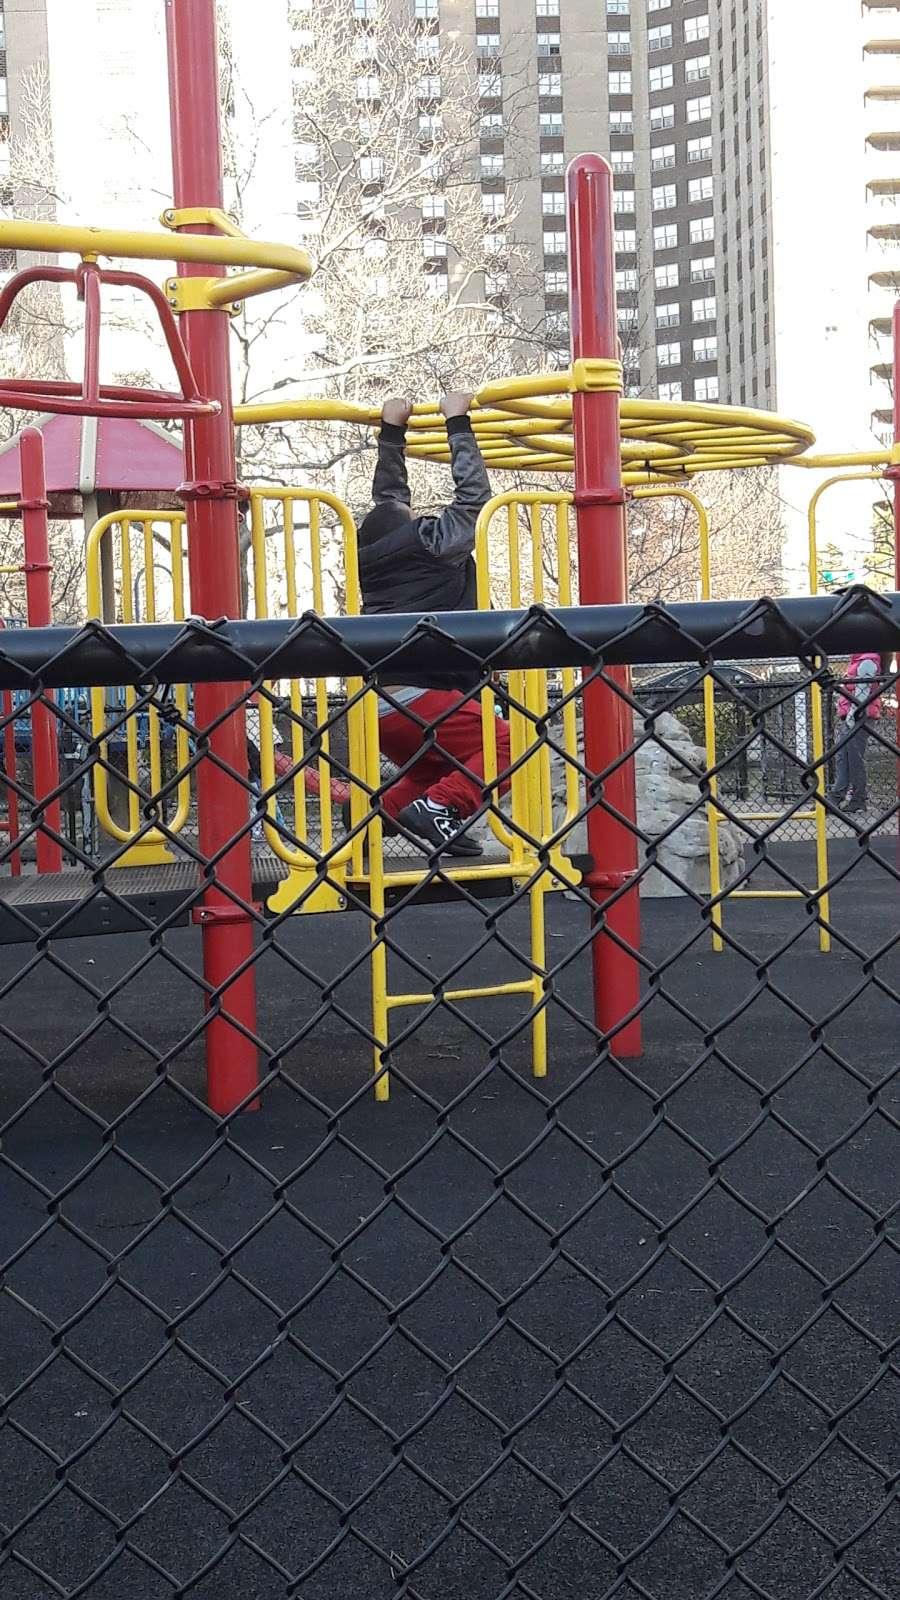 Rivers Run Garden - park  | Photo 8 of 10 | Address: 675 Co Op City Blvd, Bronx, NY 10475, USA